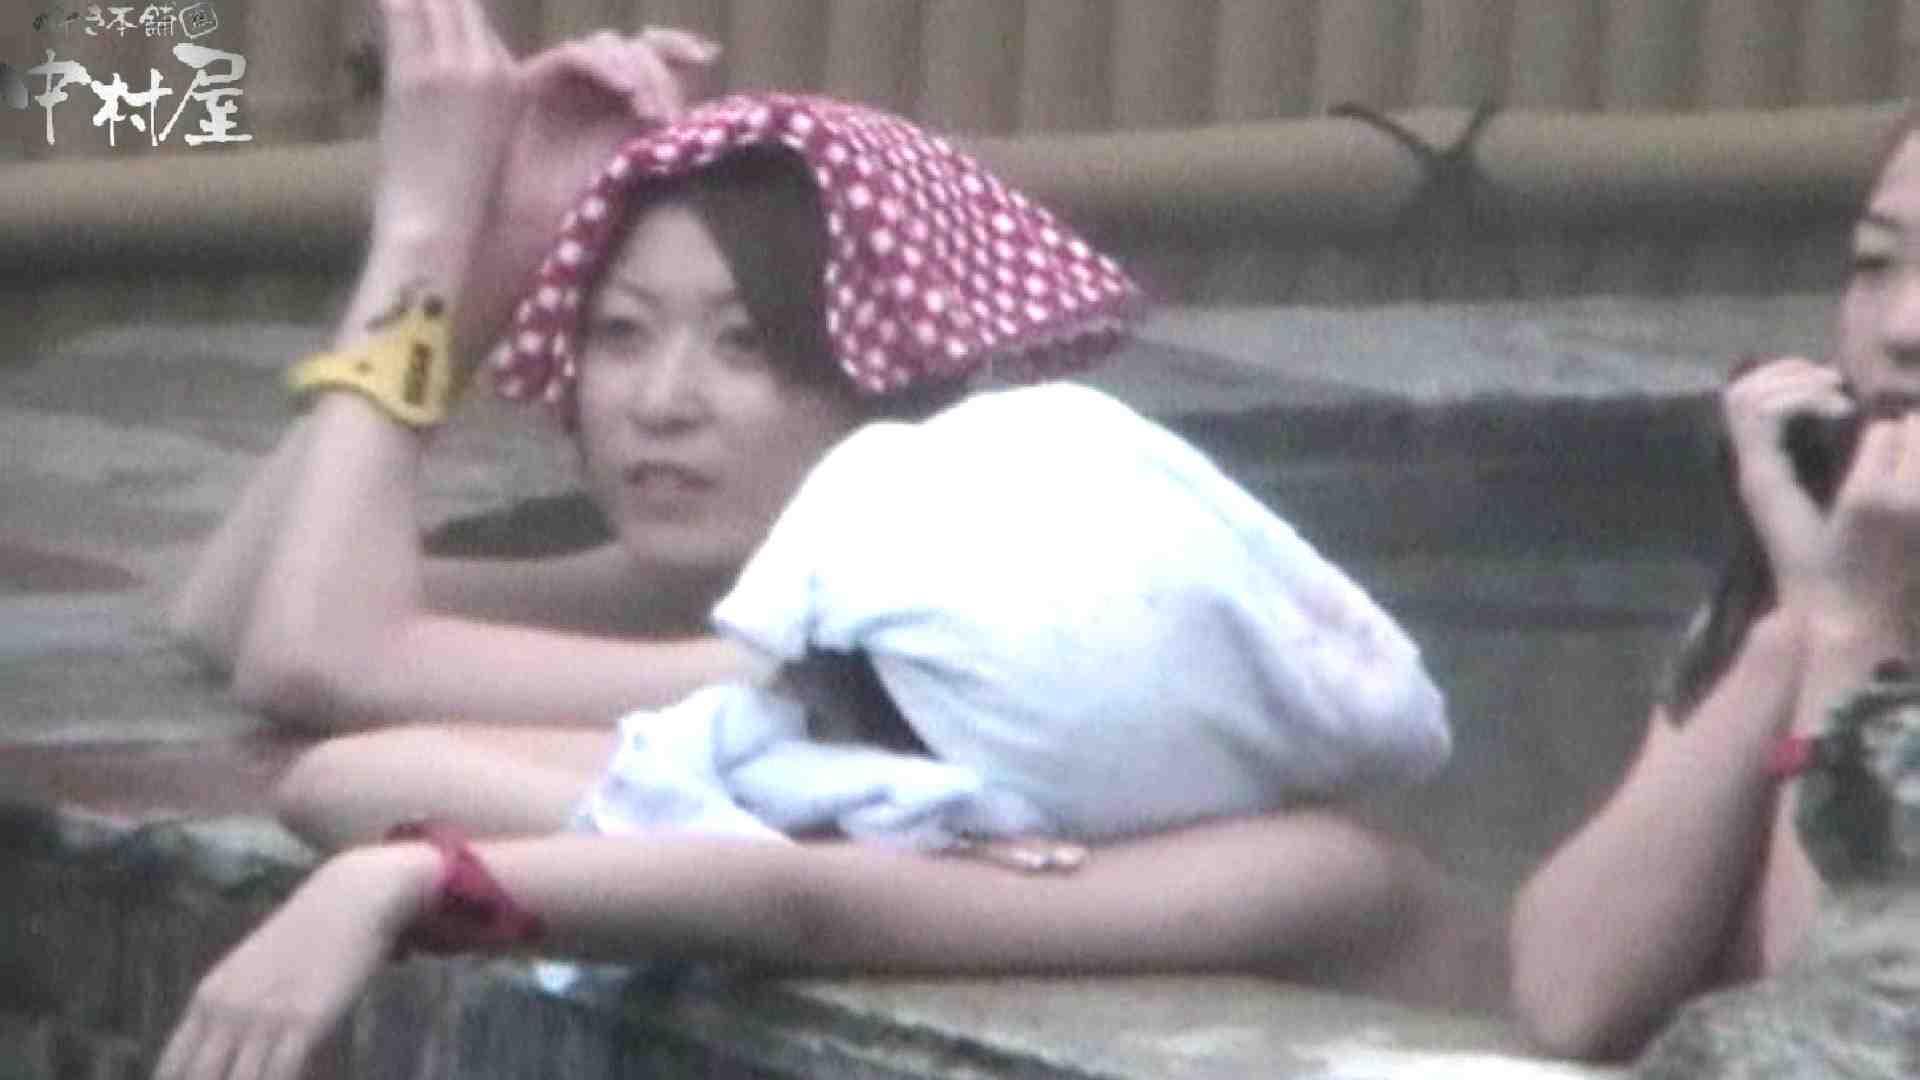 Aquaな露天風呂Vol.554 盗撮師作品  86pic 81